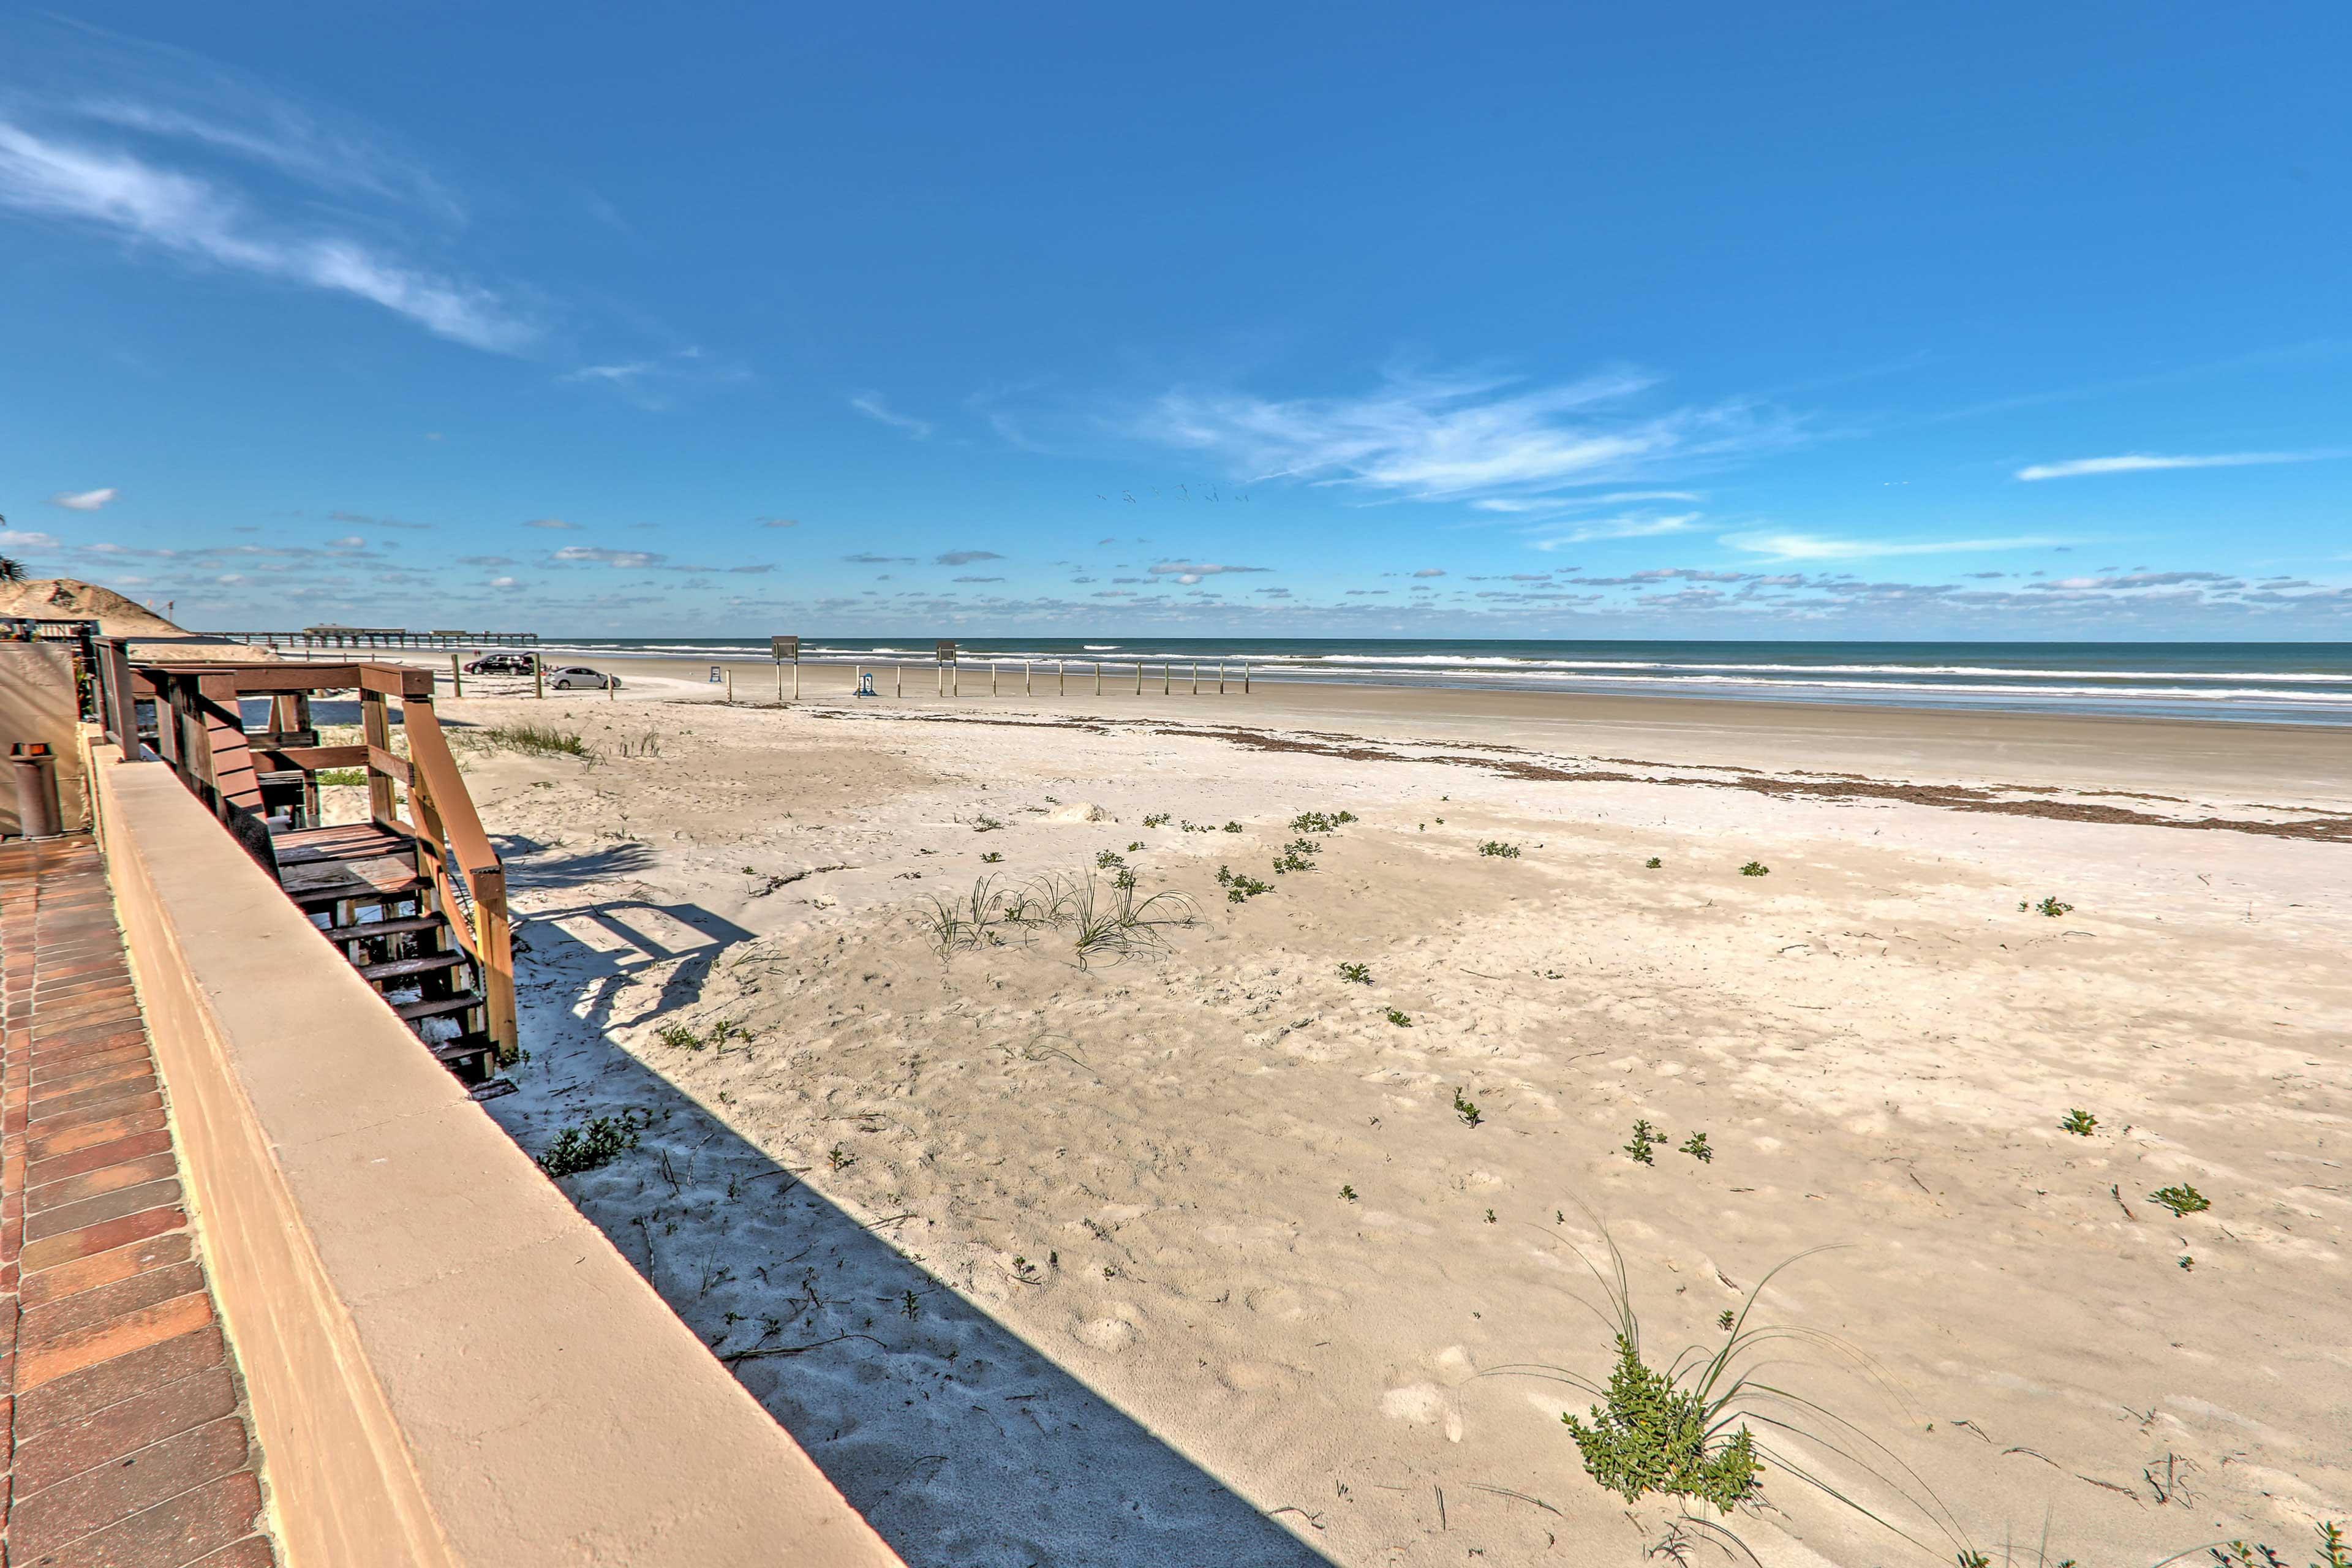 Book this cozy vacation rental condo for the ultimate Daytona Beach Shores getaway!